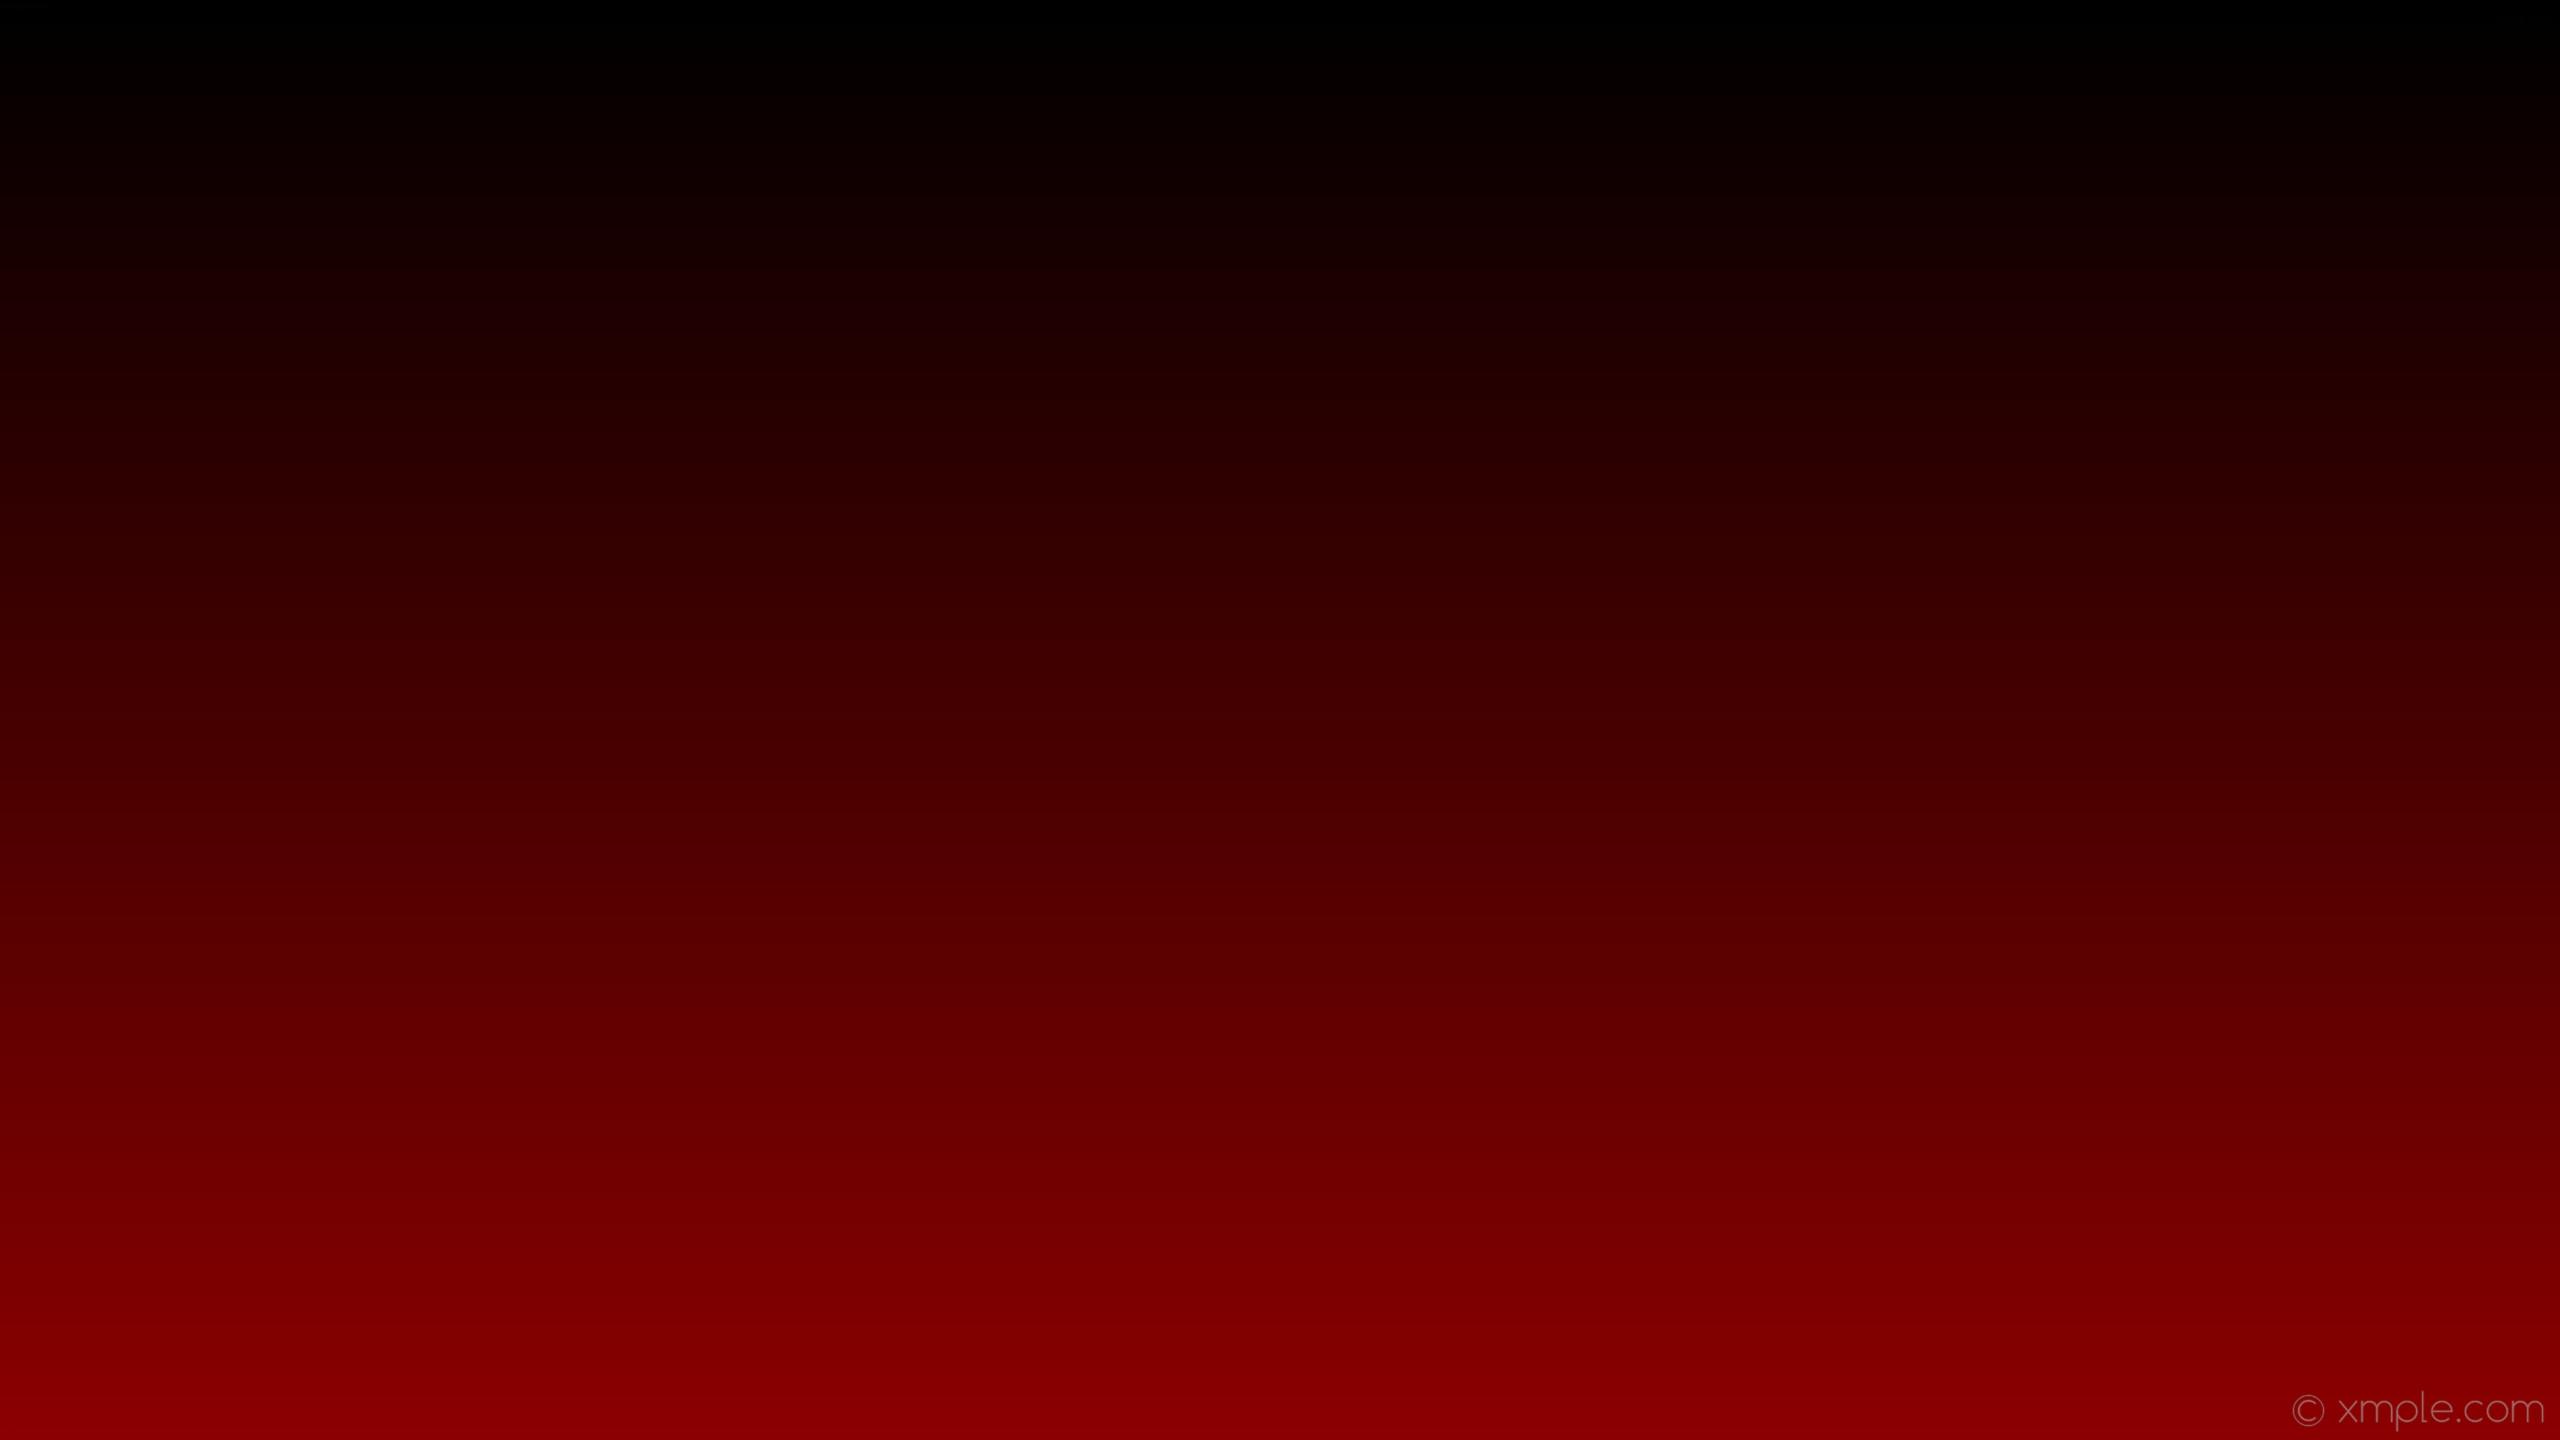 94 2560 X 1440 Wallpaper Black Black And Red Gradient Background 2560x1440 Wallpaper Teahub Io